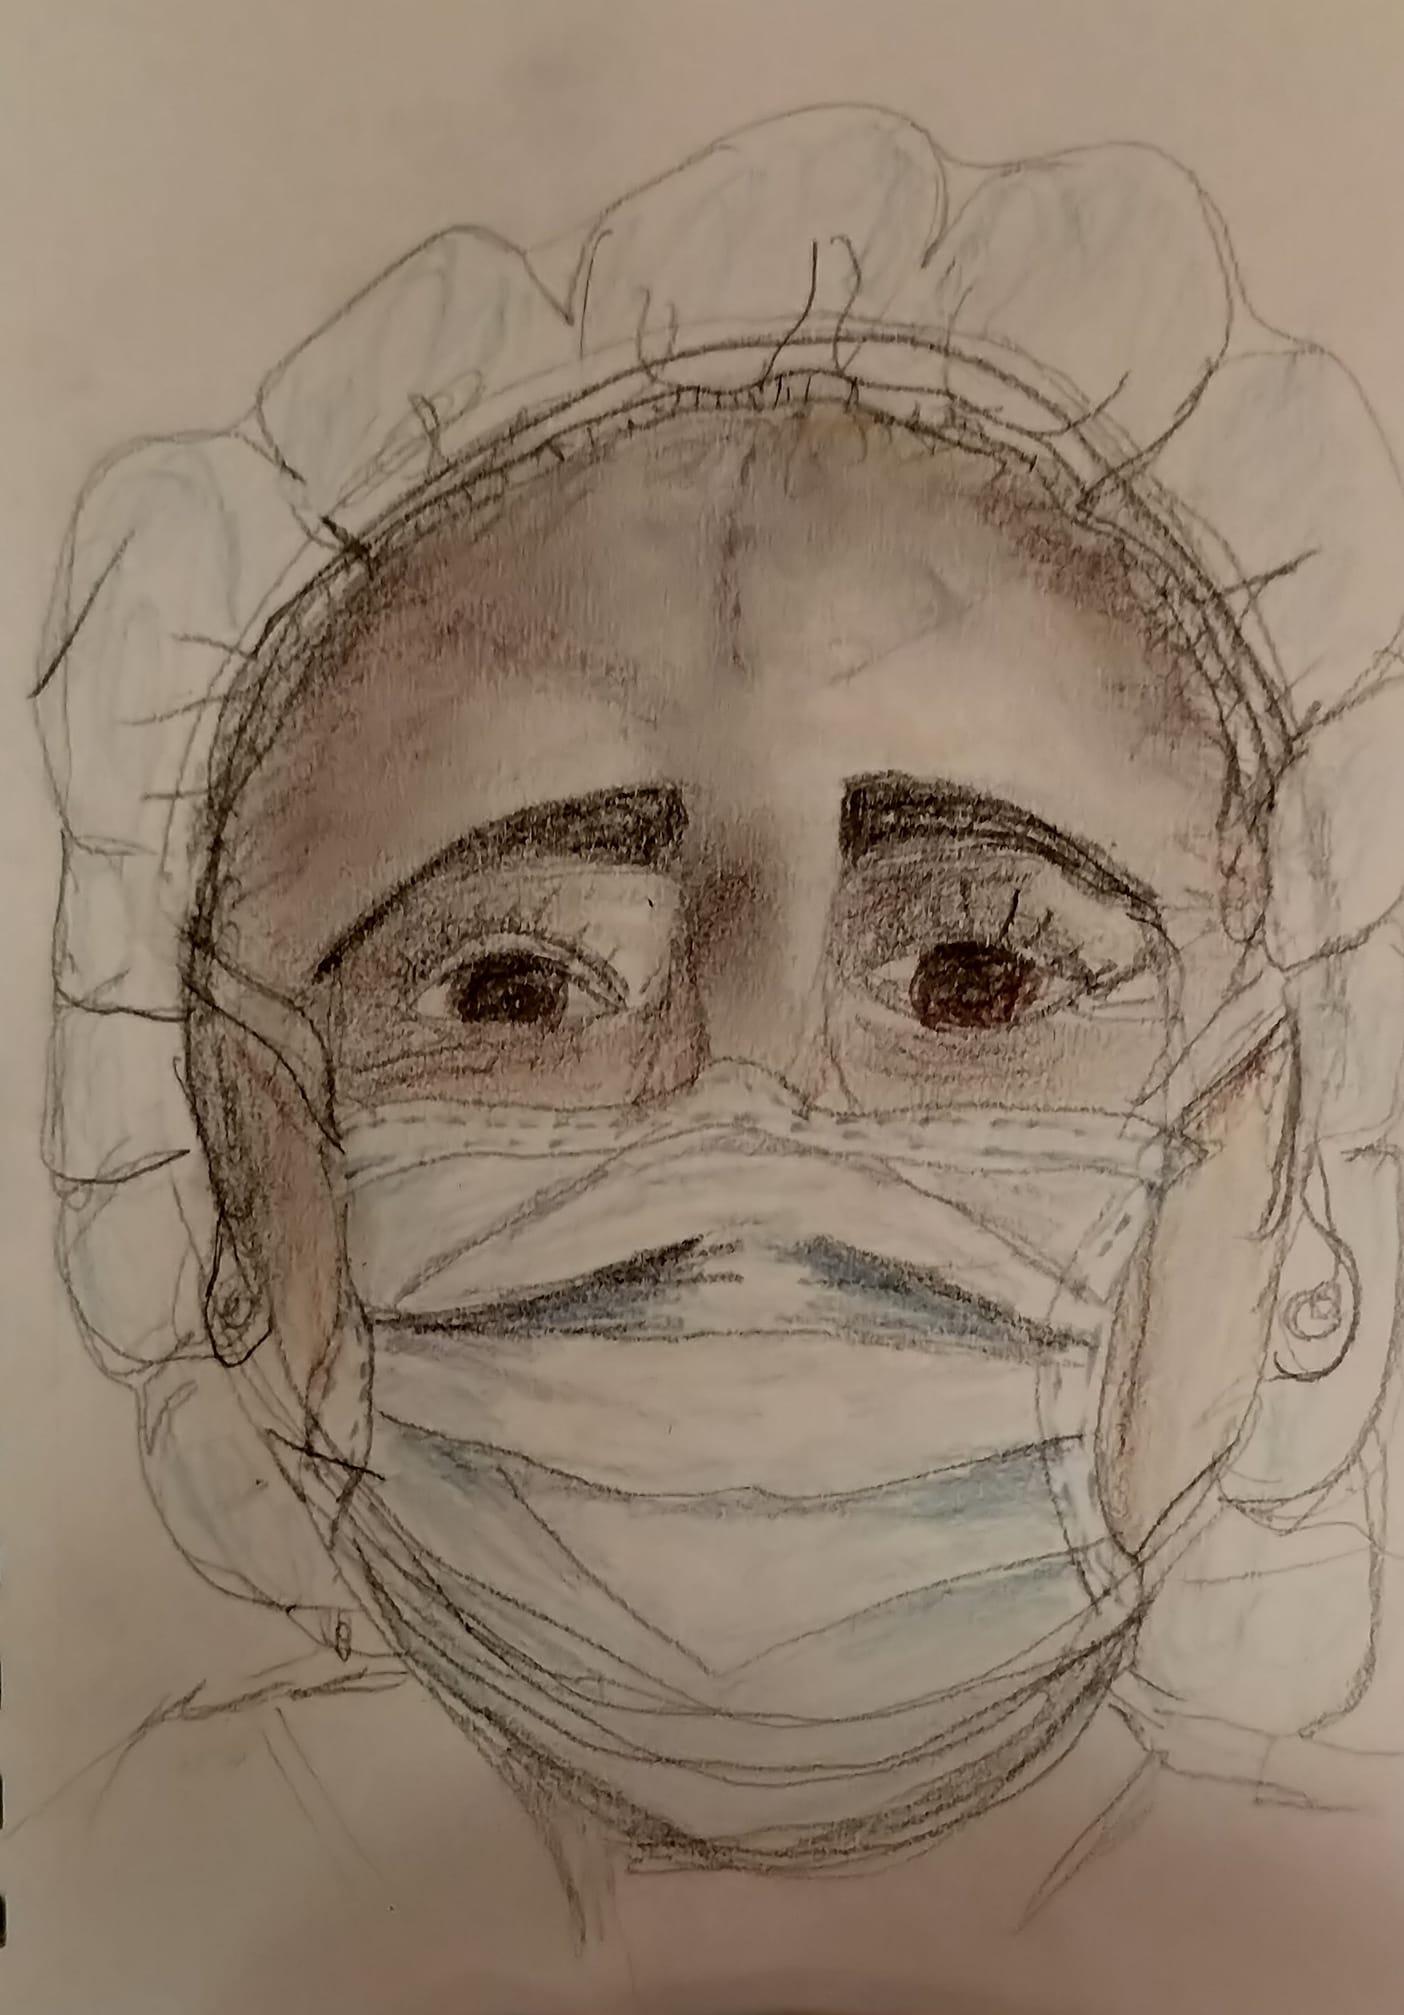 Leila Portrait for Healthcare Heroes